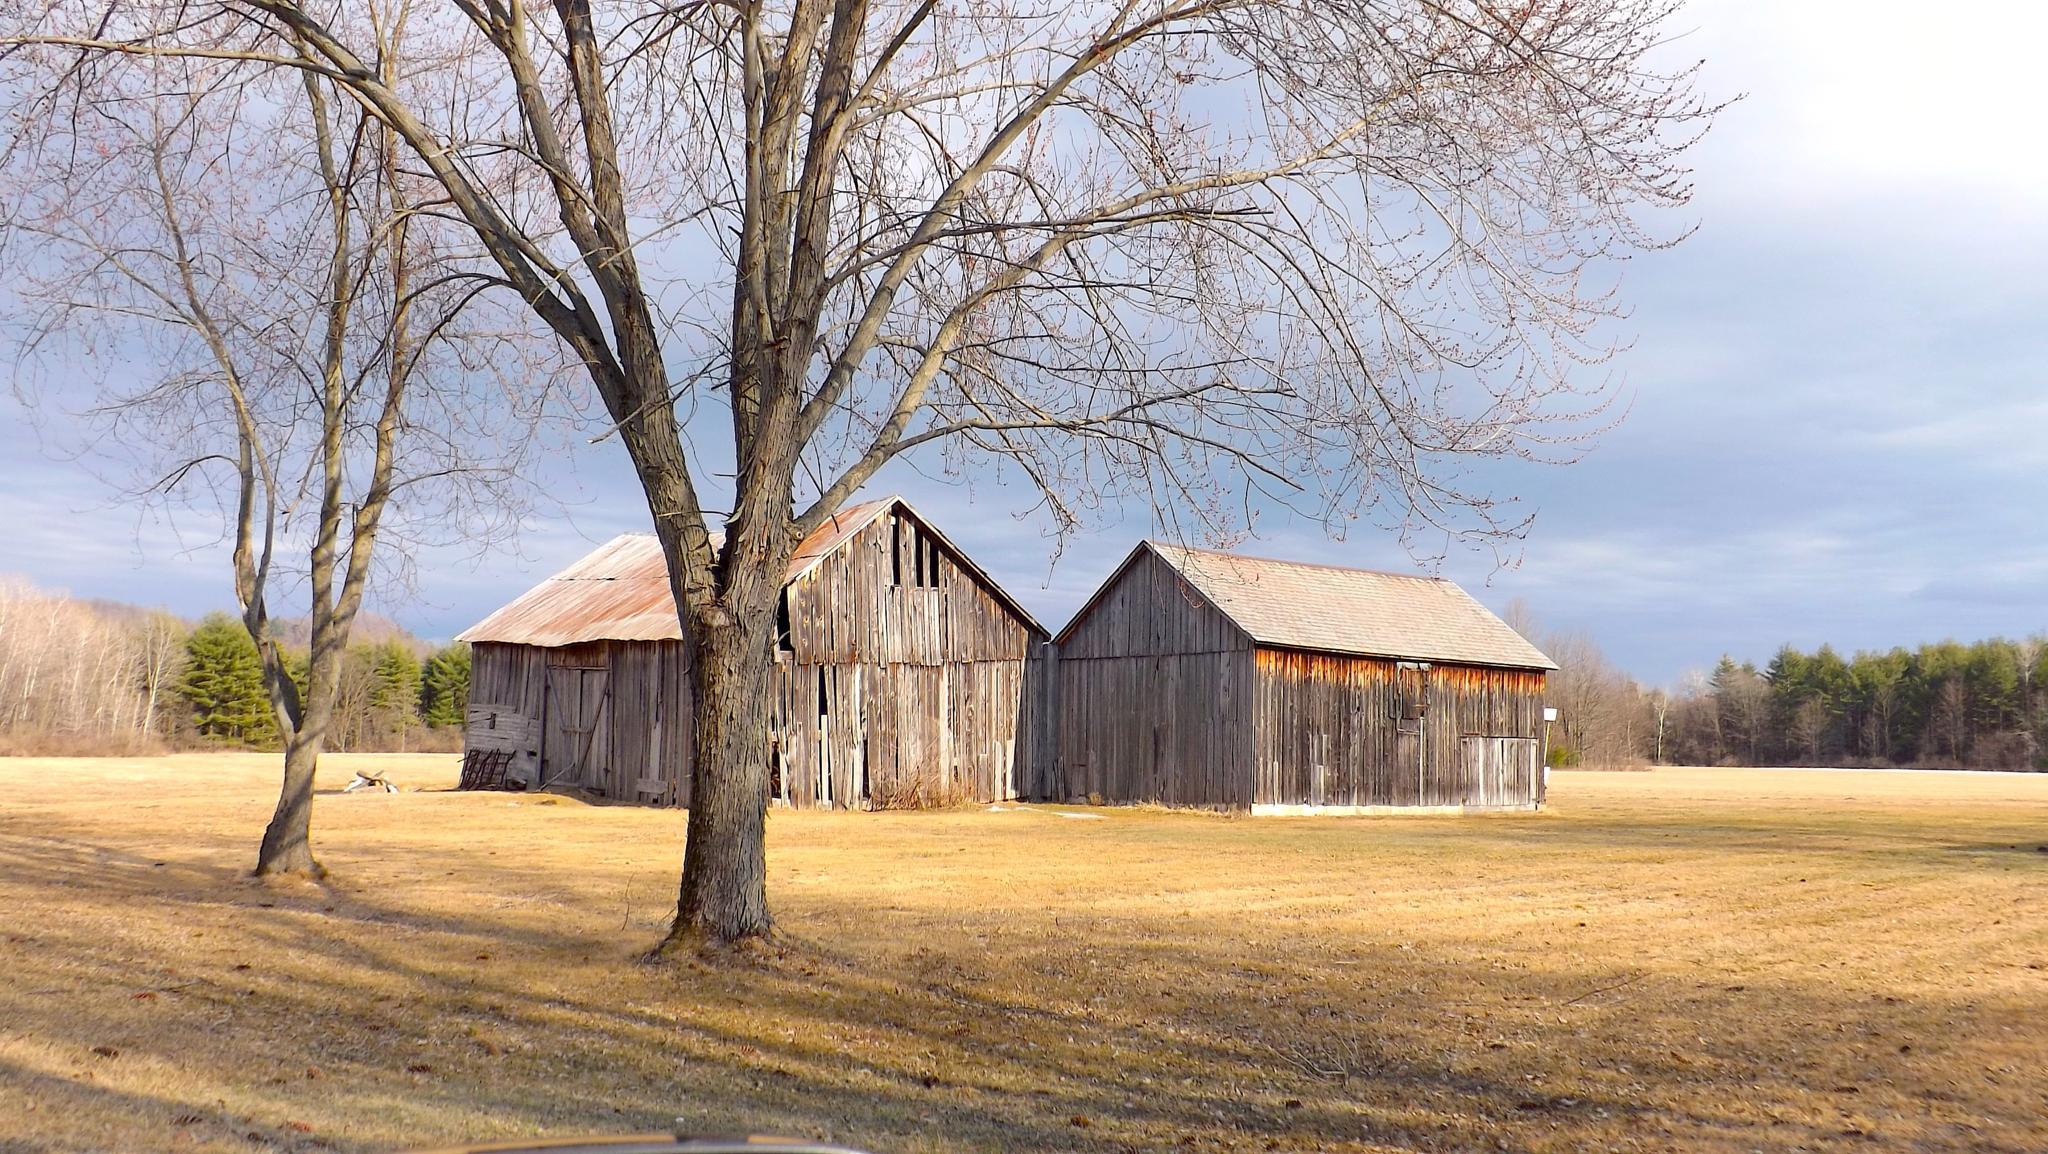 Two Barns by ccbarron1